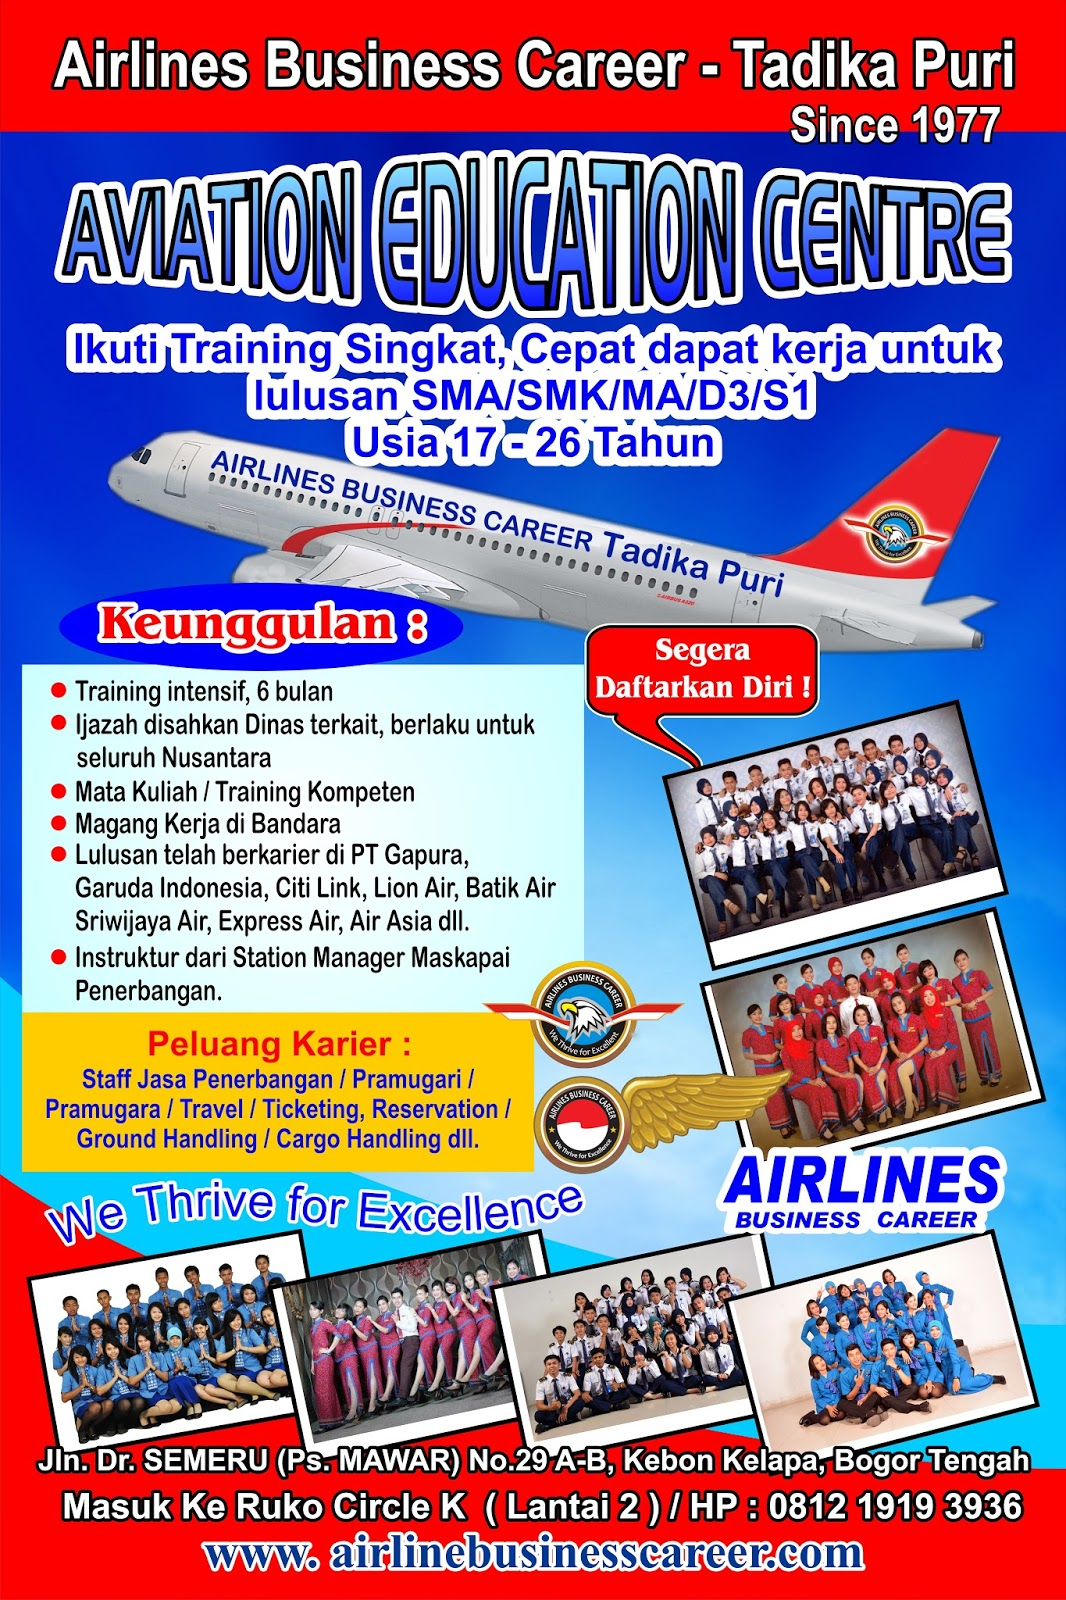 Airlines Business Career Tadika Puri Bogor